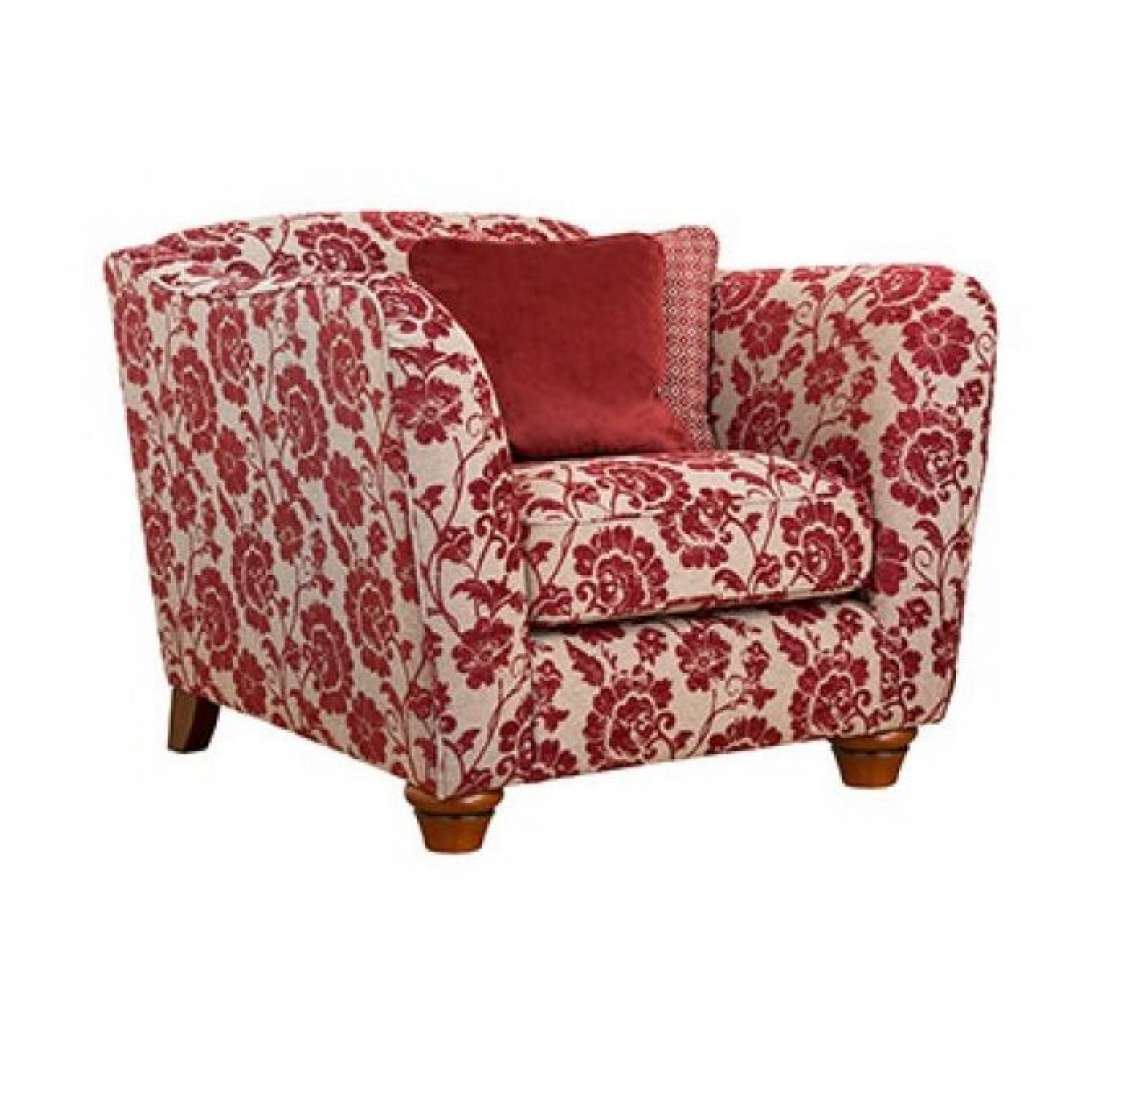 Cornish Single Pine Wardrobe with drawer - Lauries Furniture, Somerset